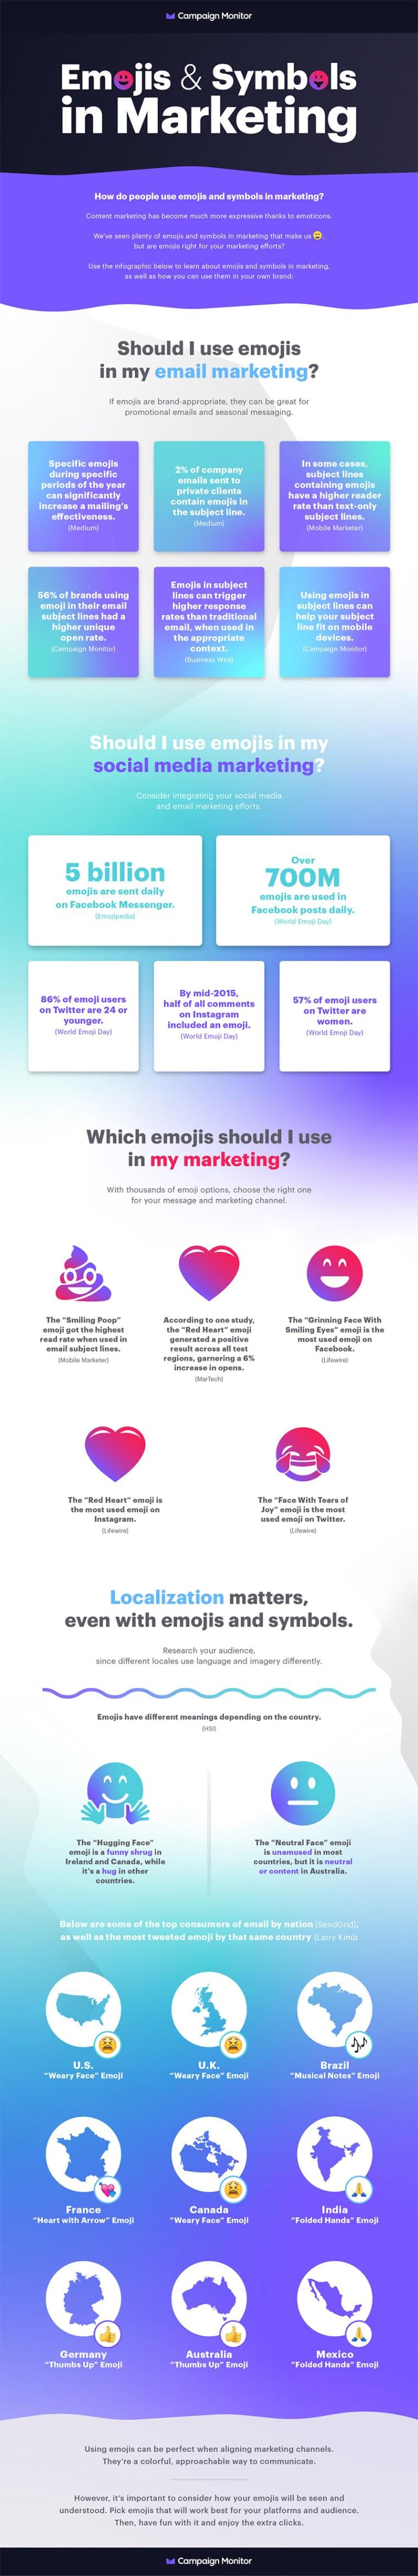 Infographic looks at emoji usage in marketing